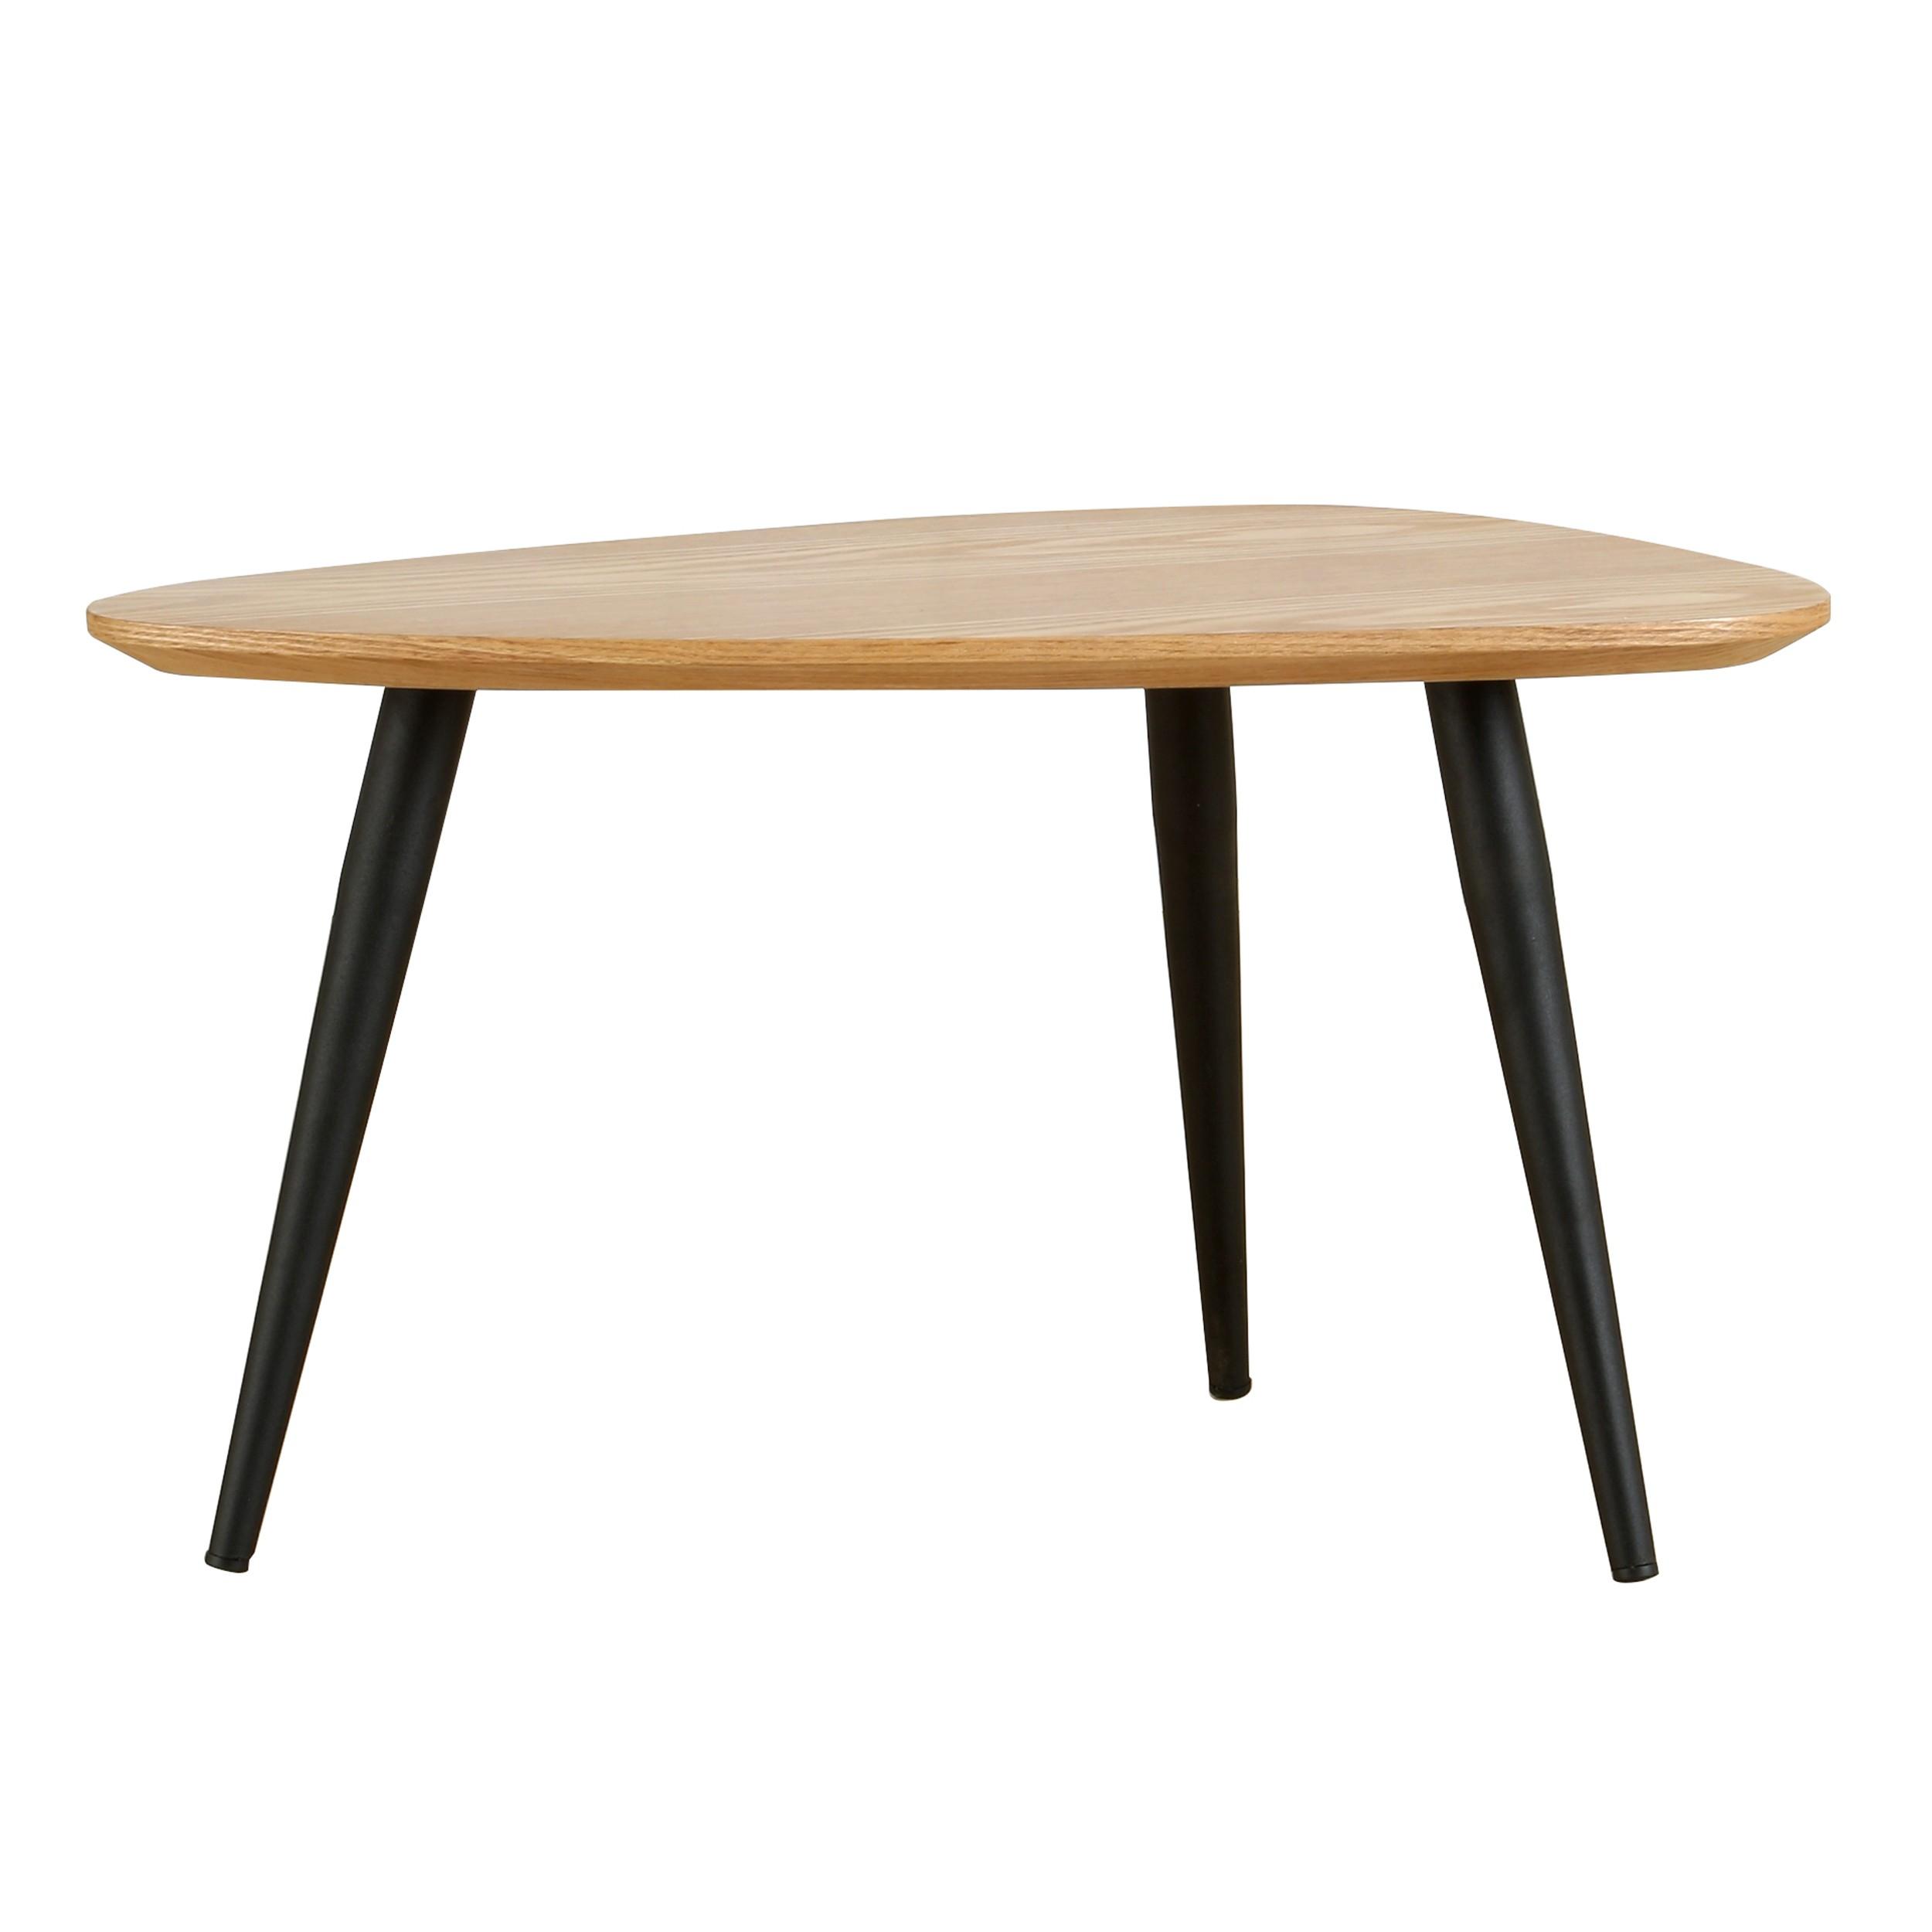 70 Kuopio polygone Table basse cm YgIf7b6yv